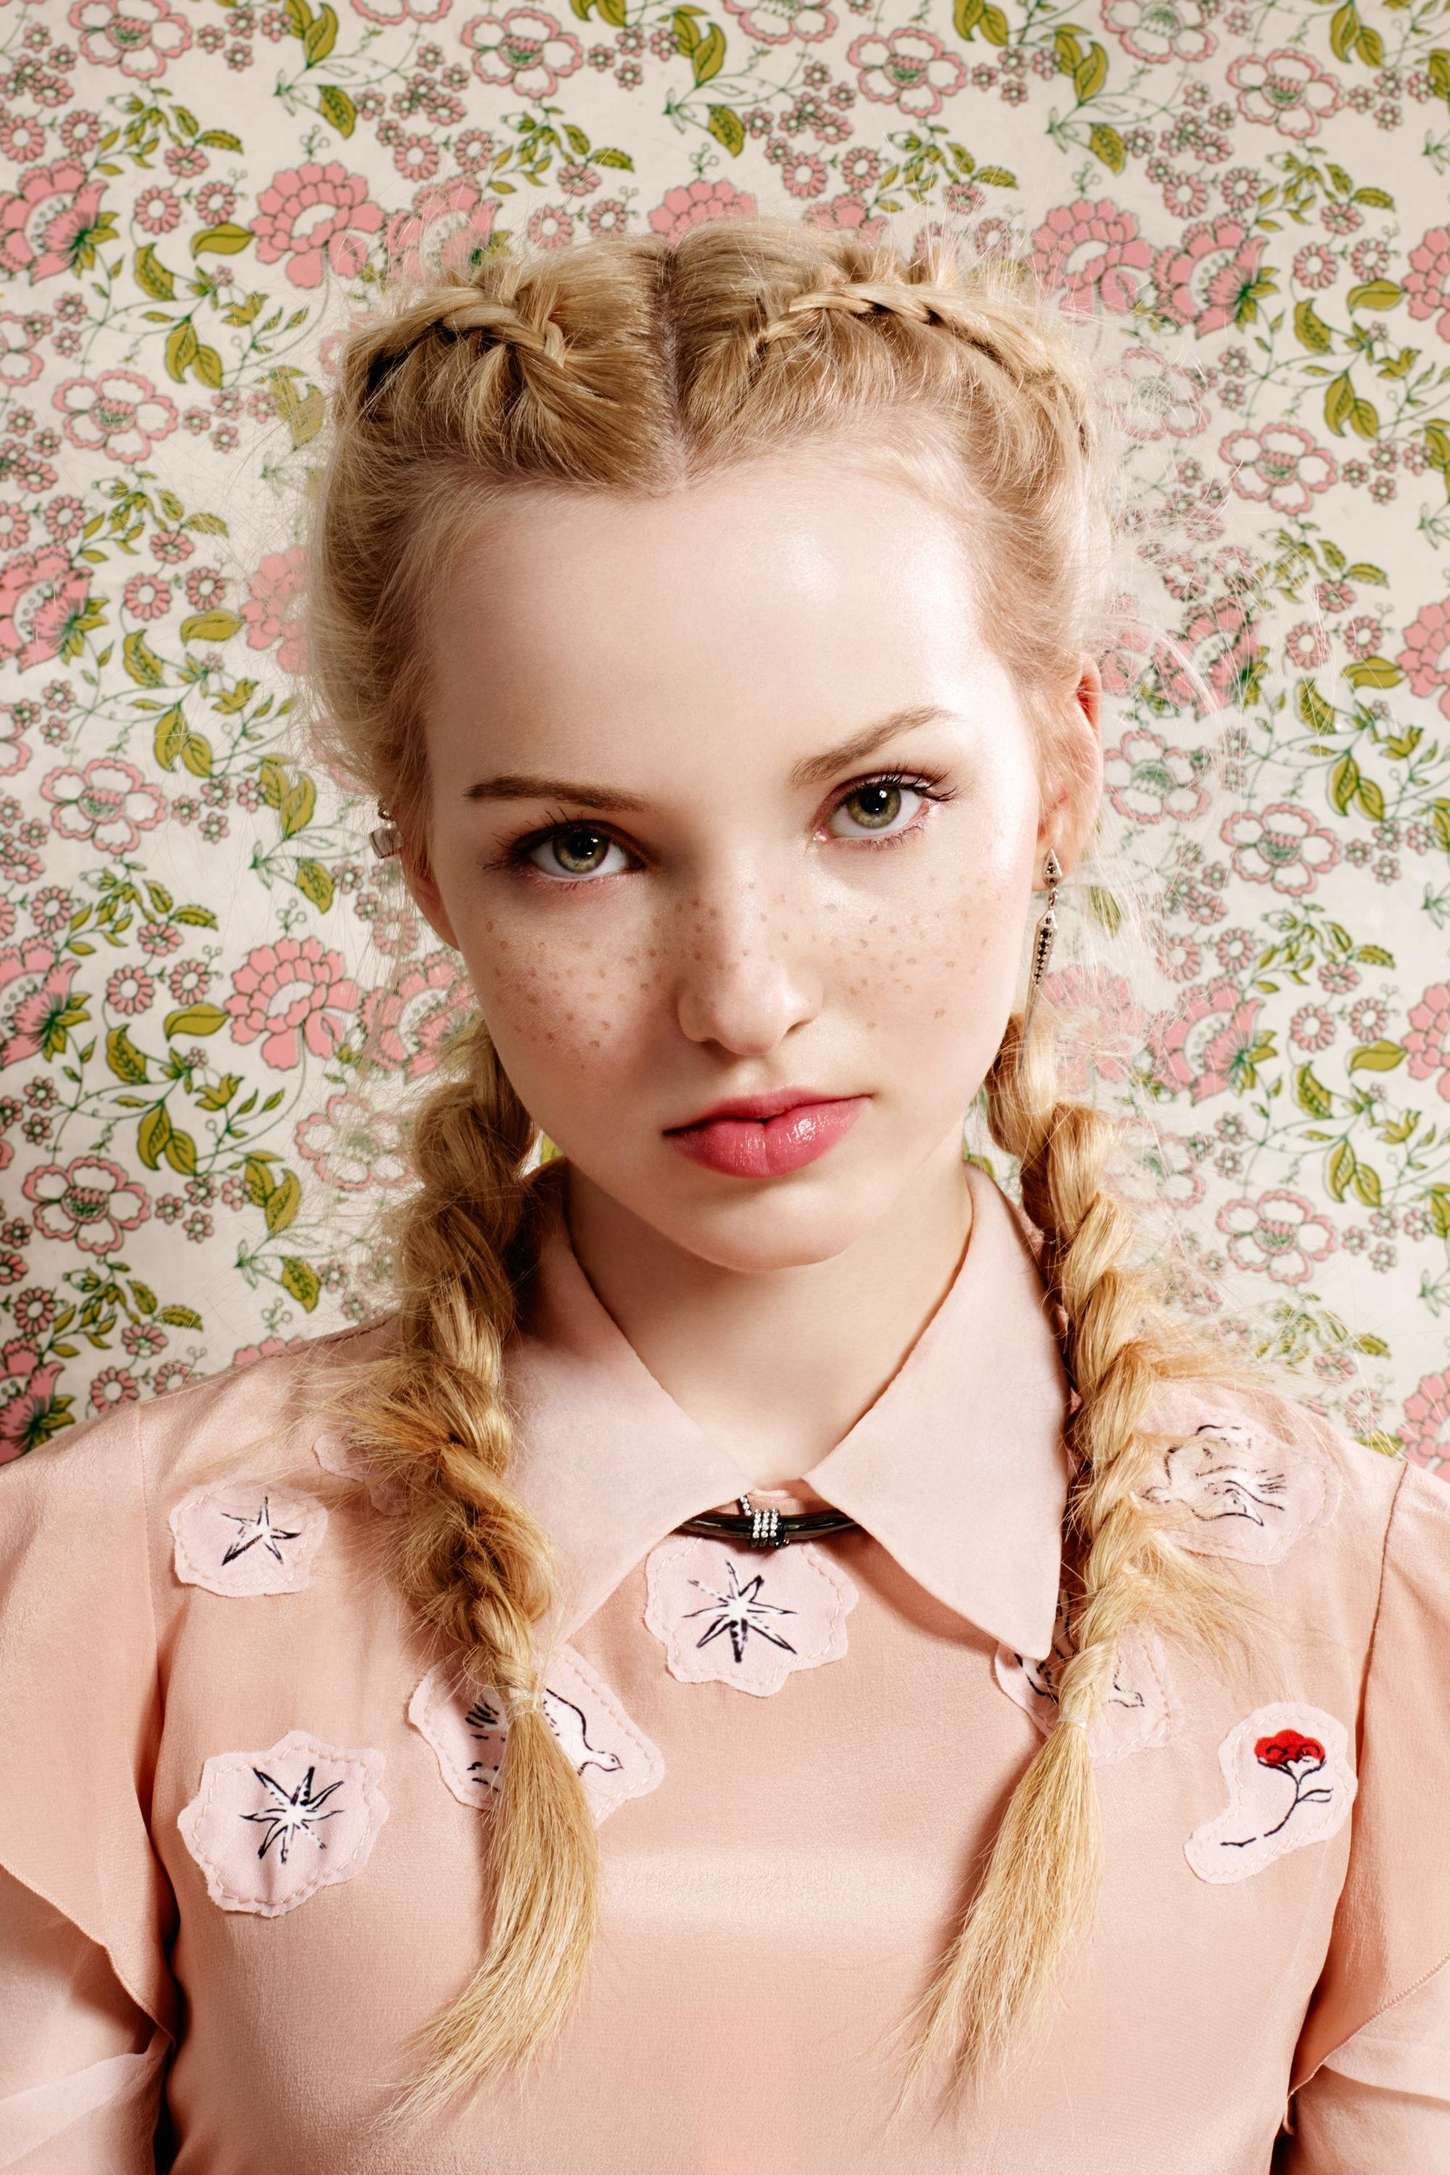 Dove Cameron Teen Vogue Photoshoot 2015 02 Gotceleb